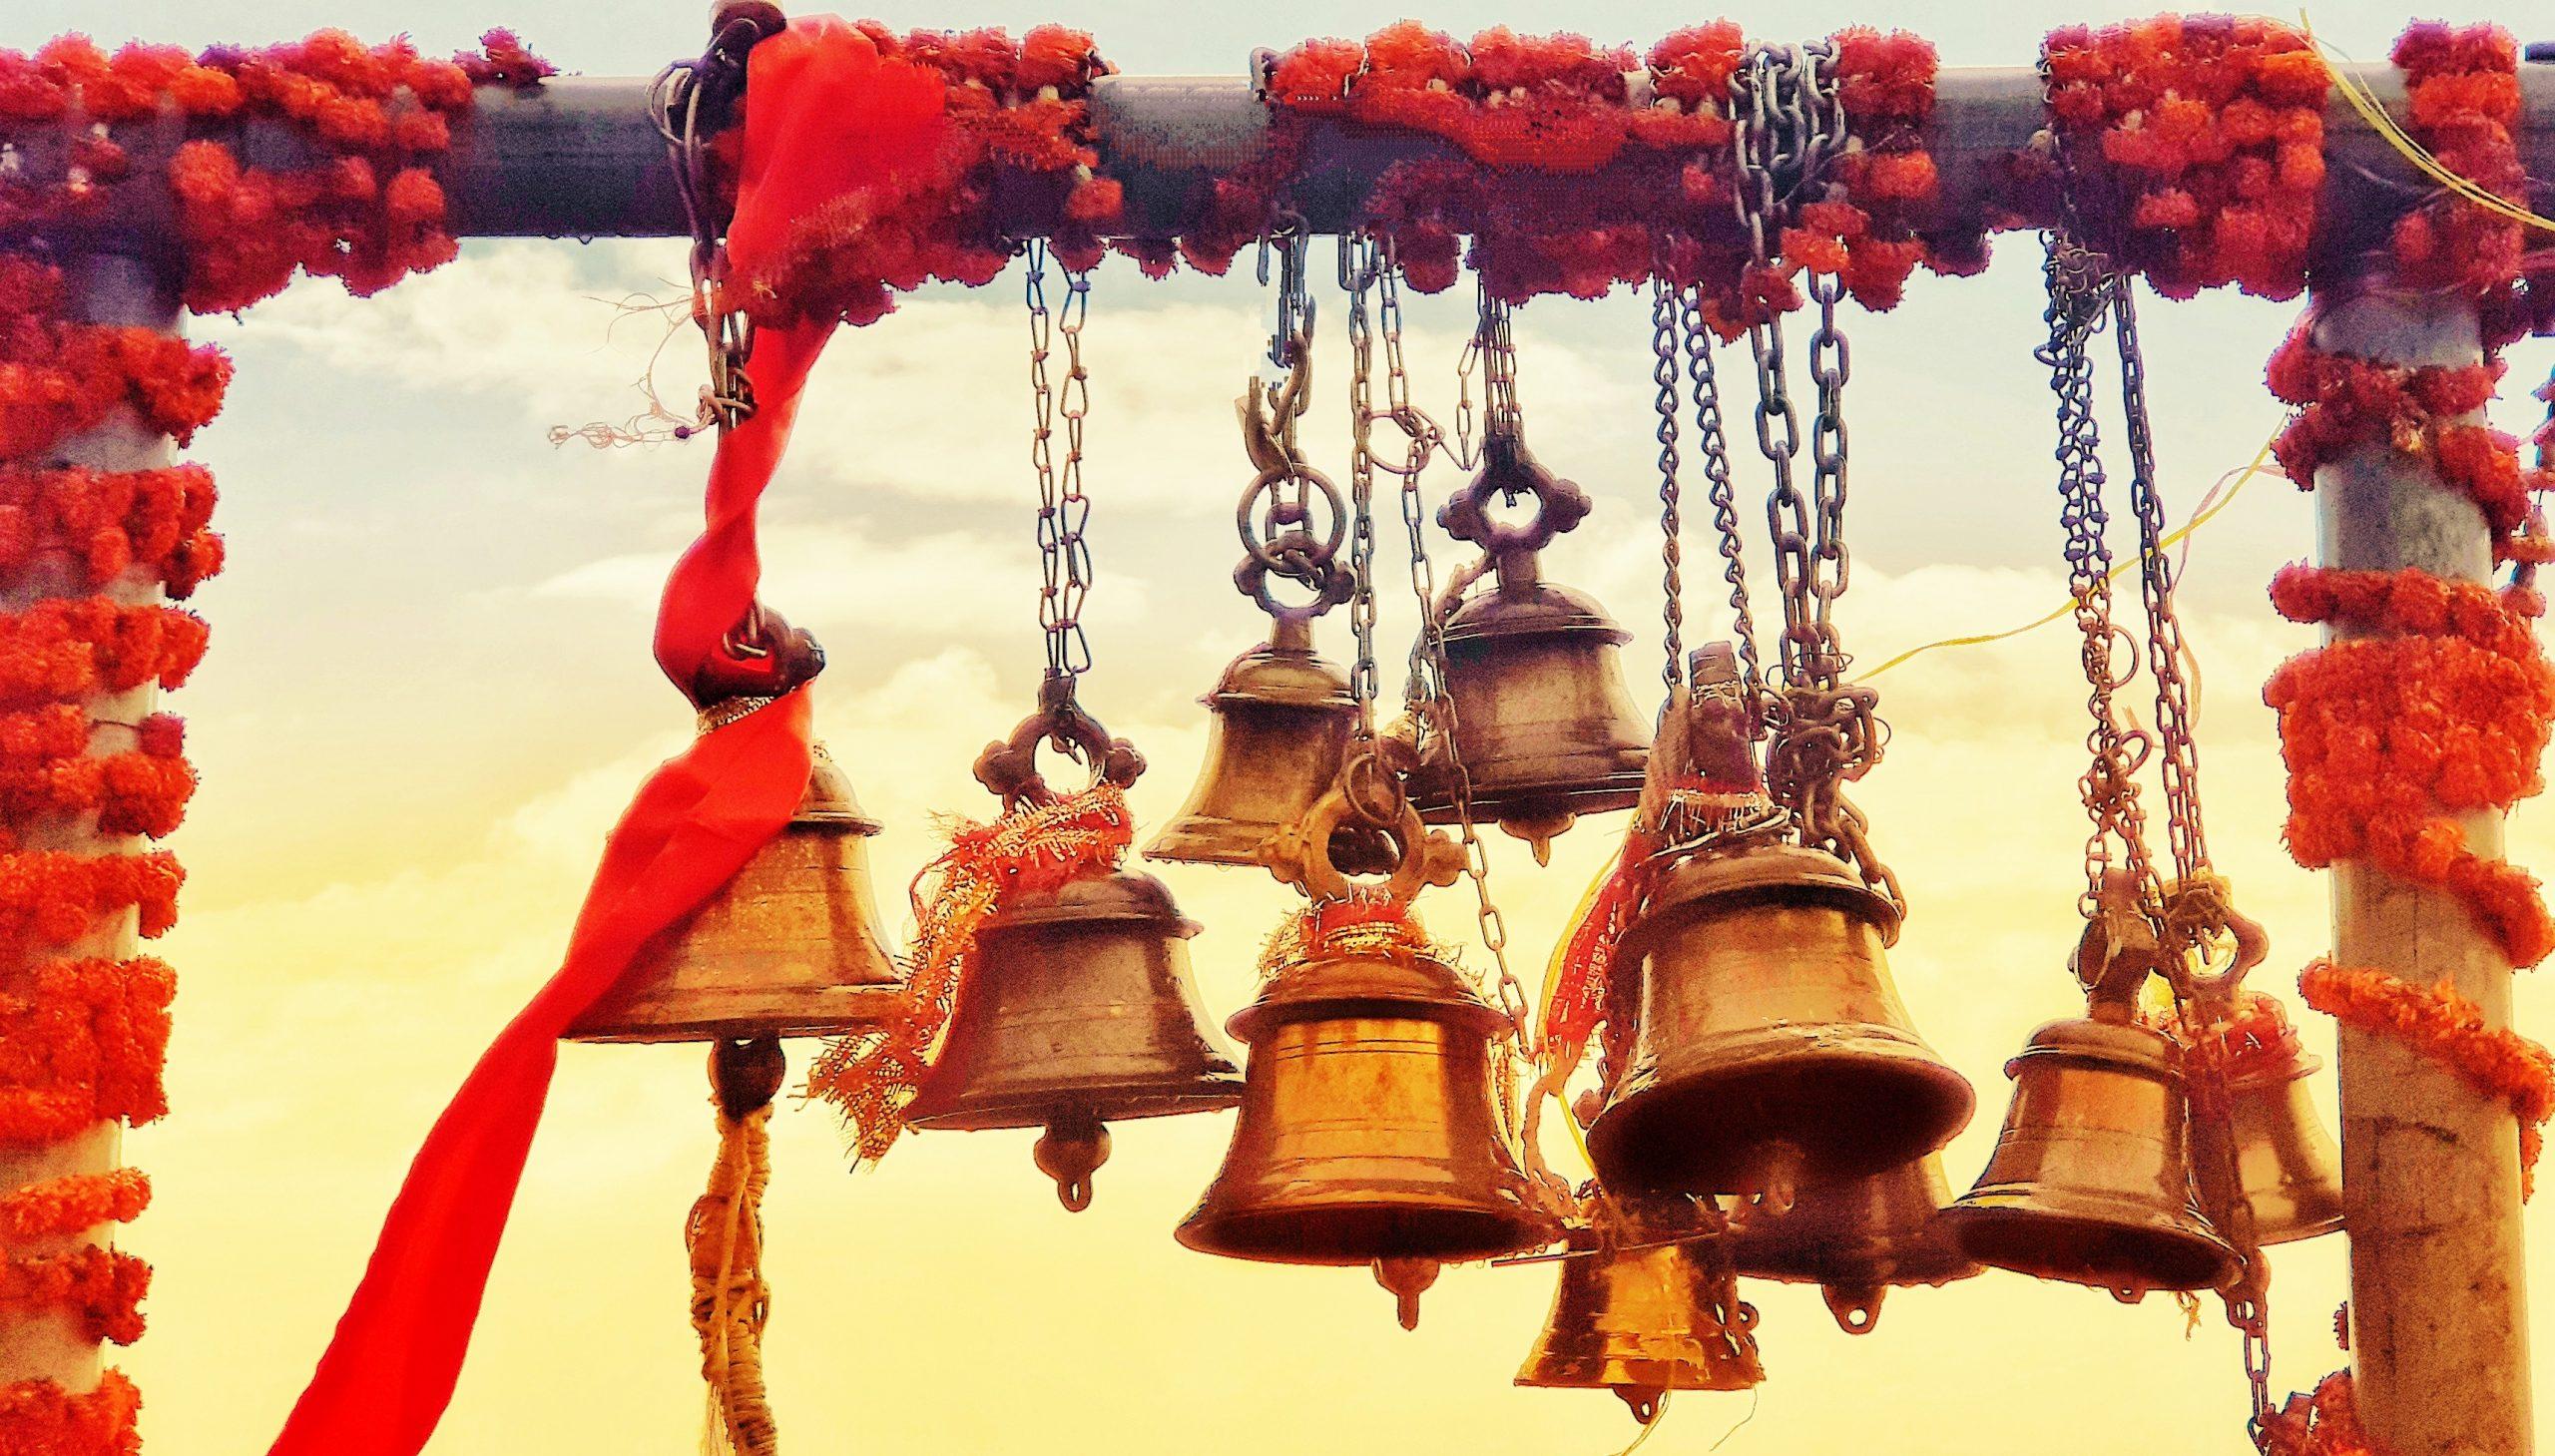 Temple bells Hanging